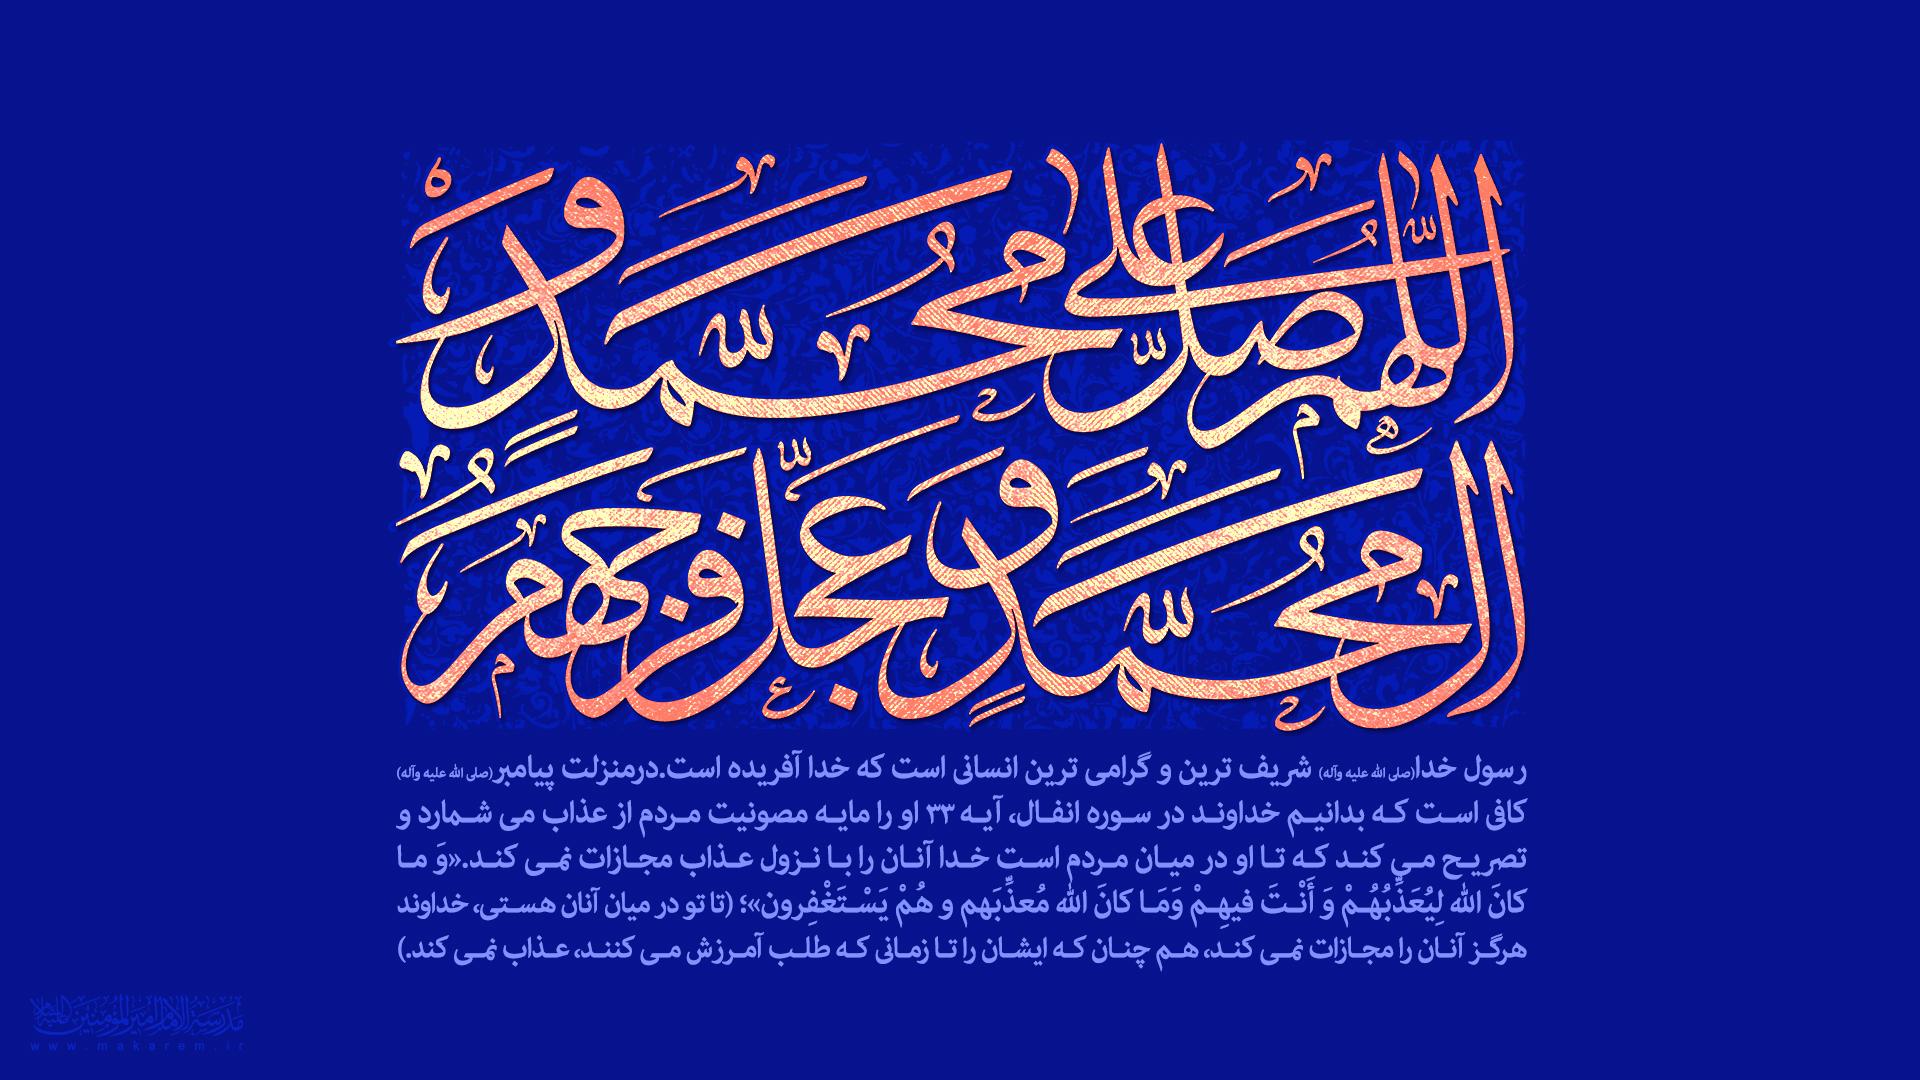 ولادت پیامبر 01-مدرسه الامام امیر المومنین (ع)